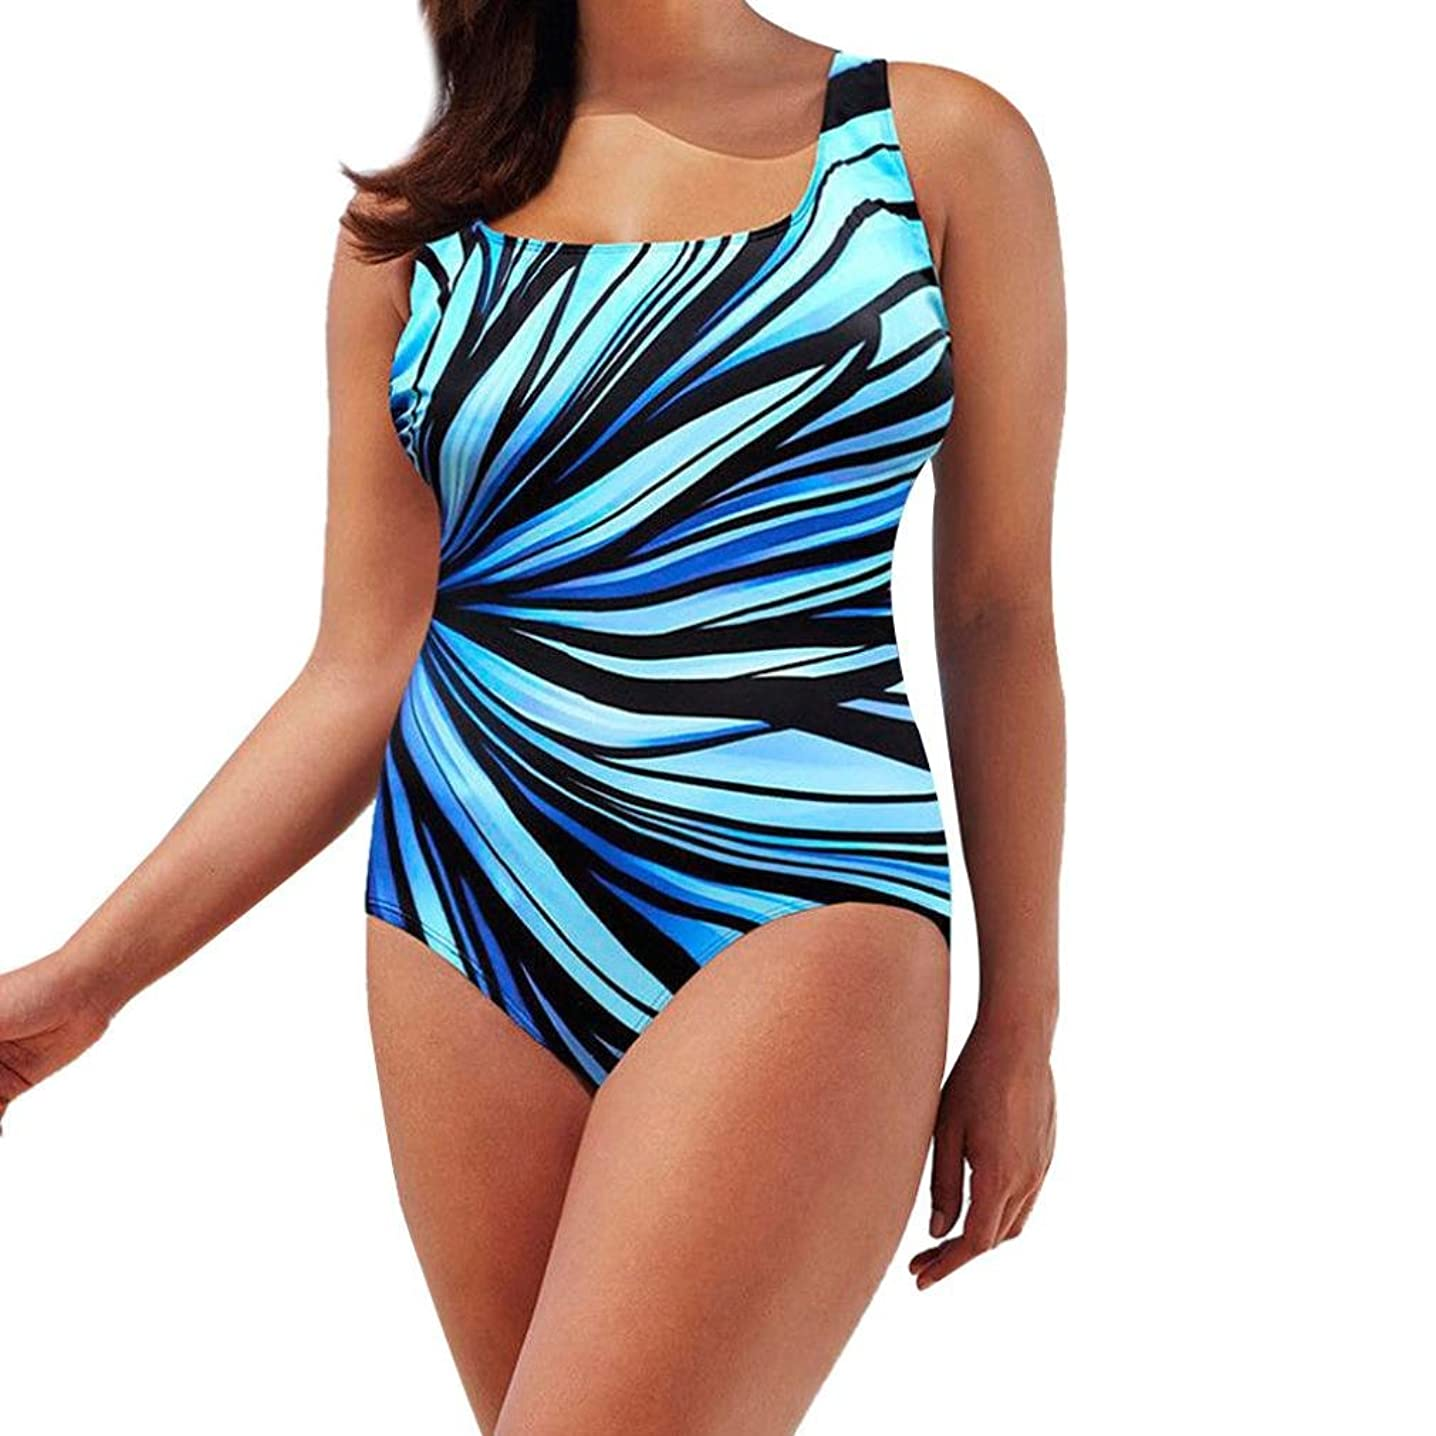 Boomboom Womens Colorful Plus Size One Piece Bikini Swimwear